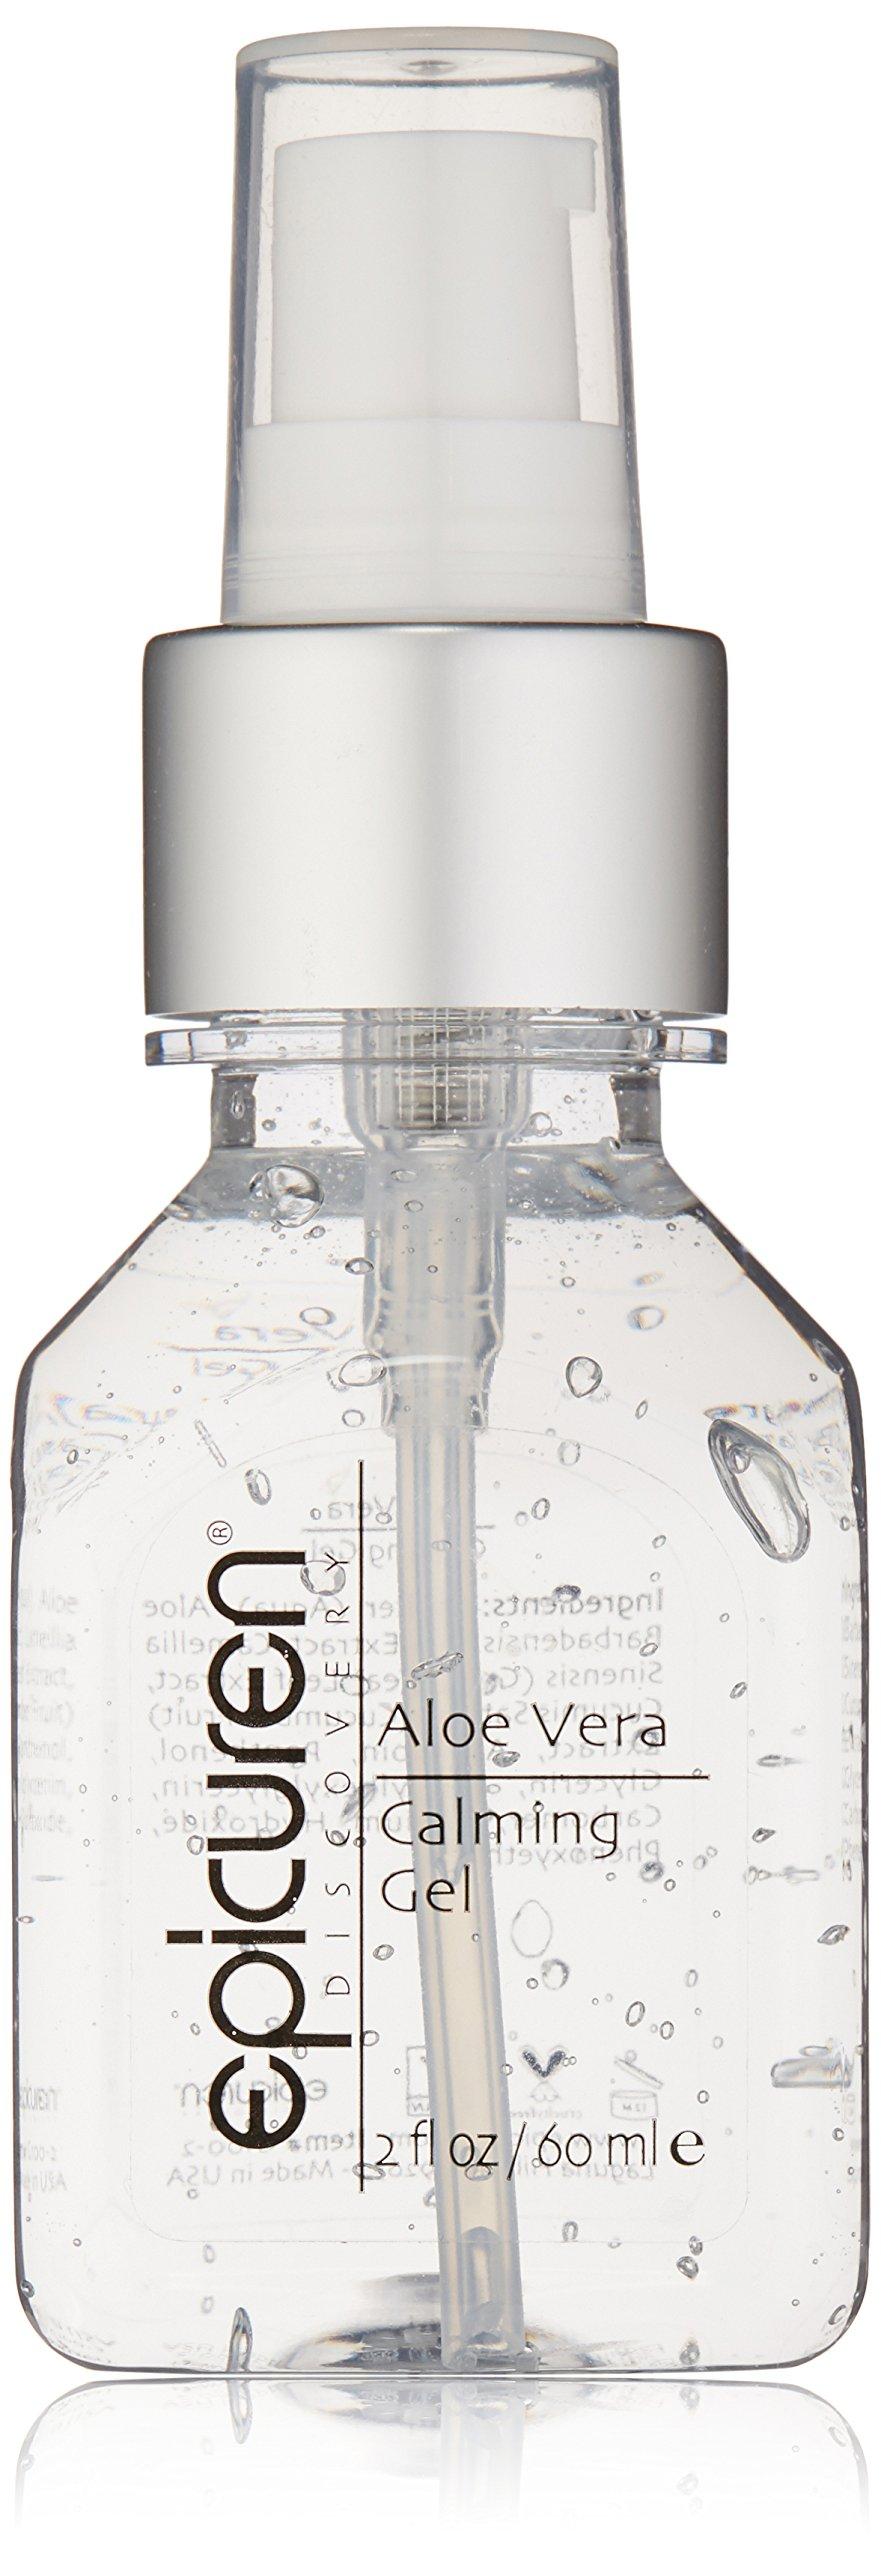 Epicuren Discovery Aloe Vera Calming Gel, 2 Fl oz by epicuren DISCOVERY